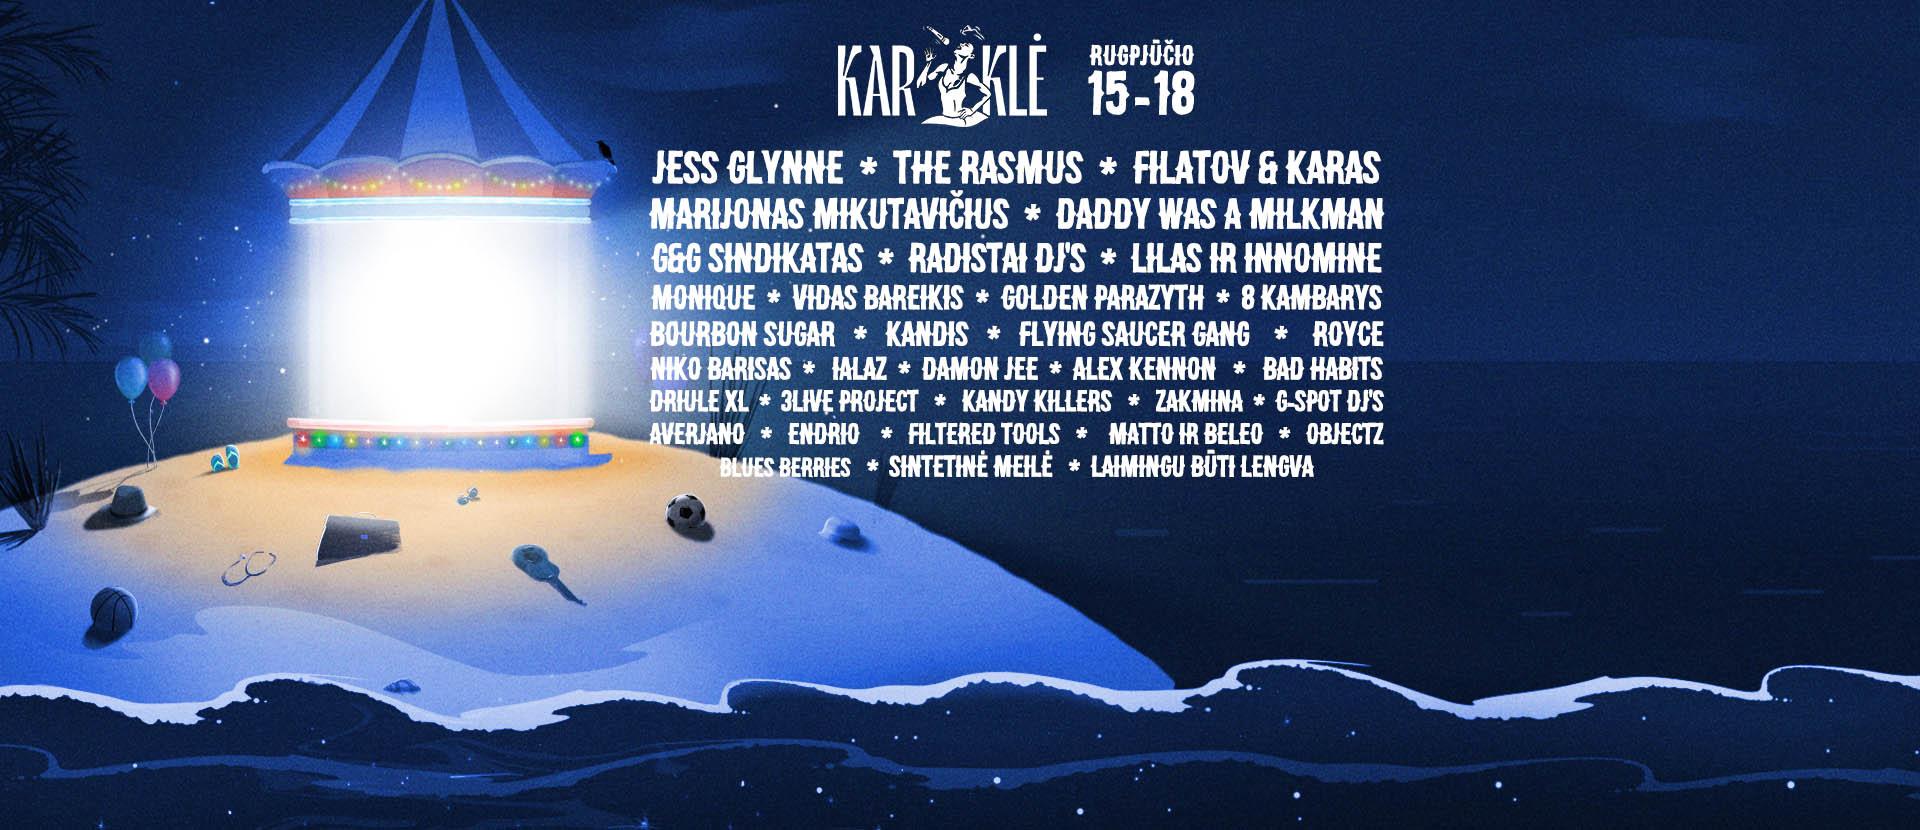 KARKLĖ FESTIVAL 2019